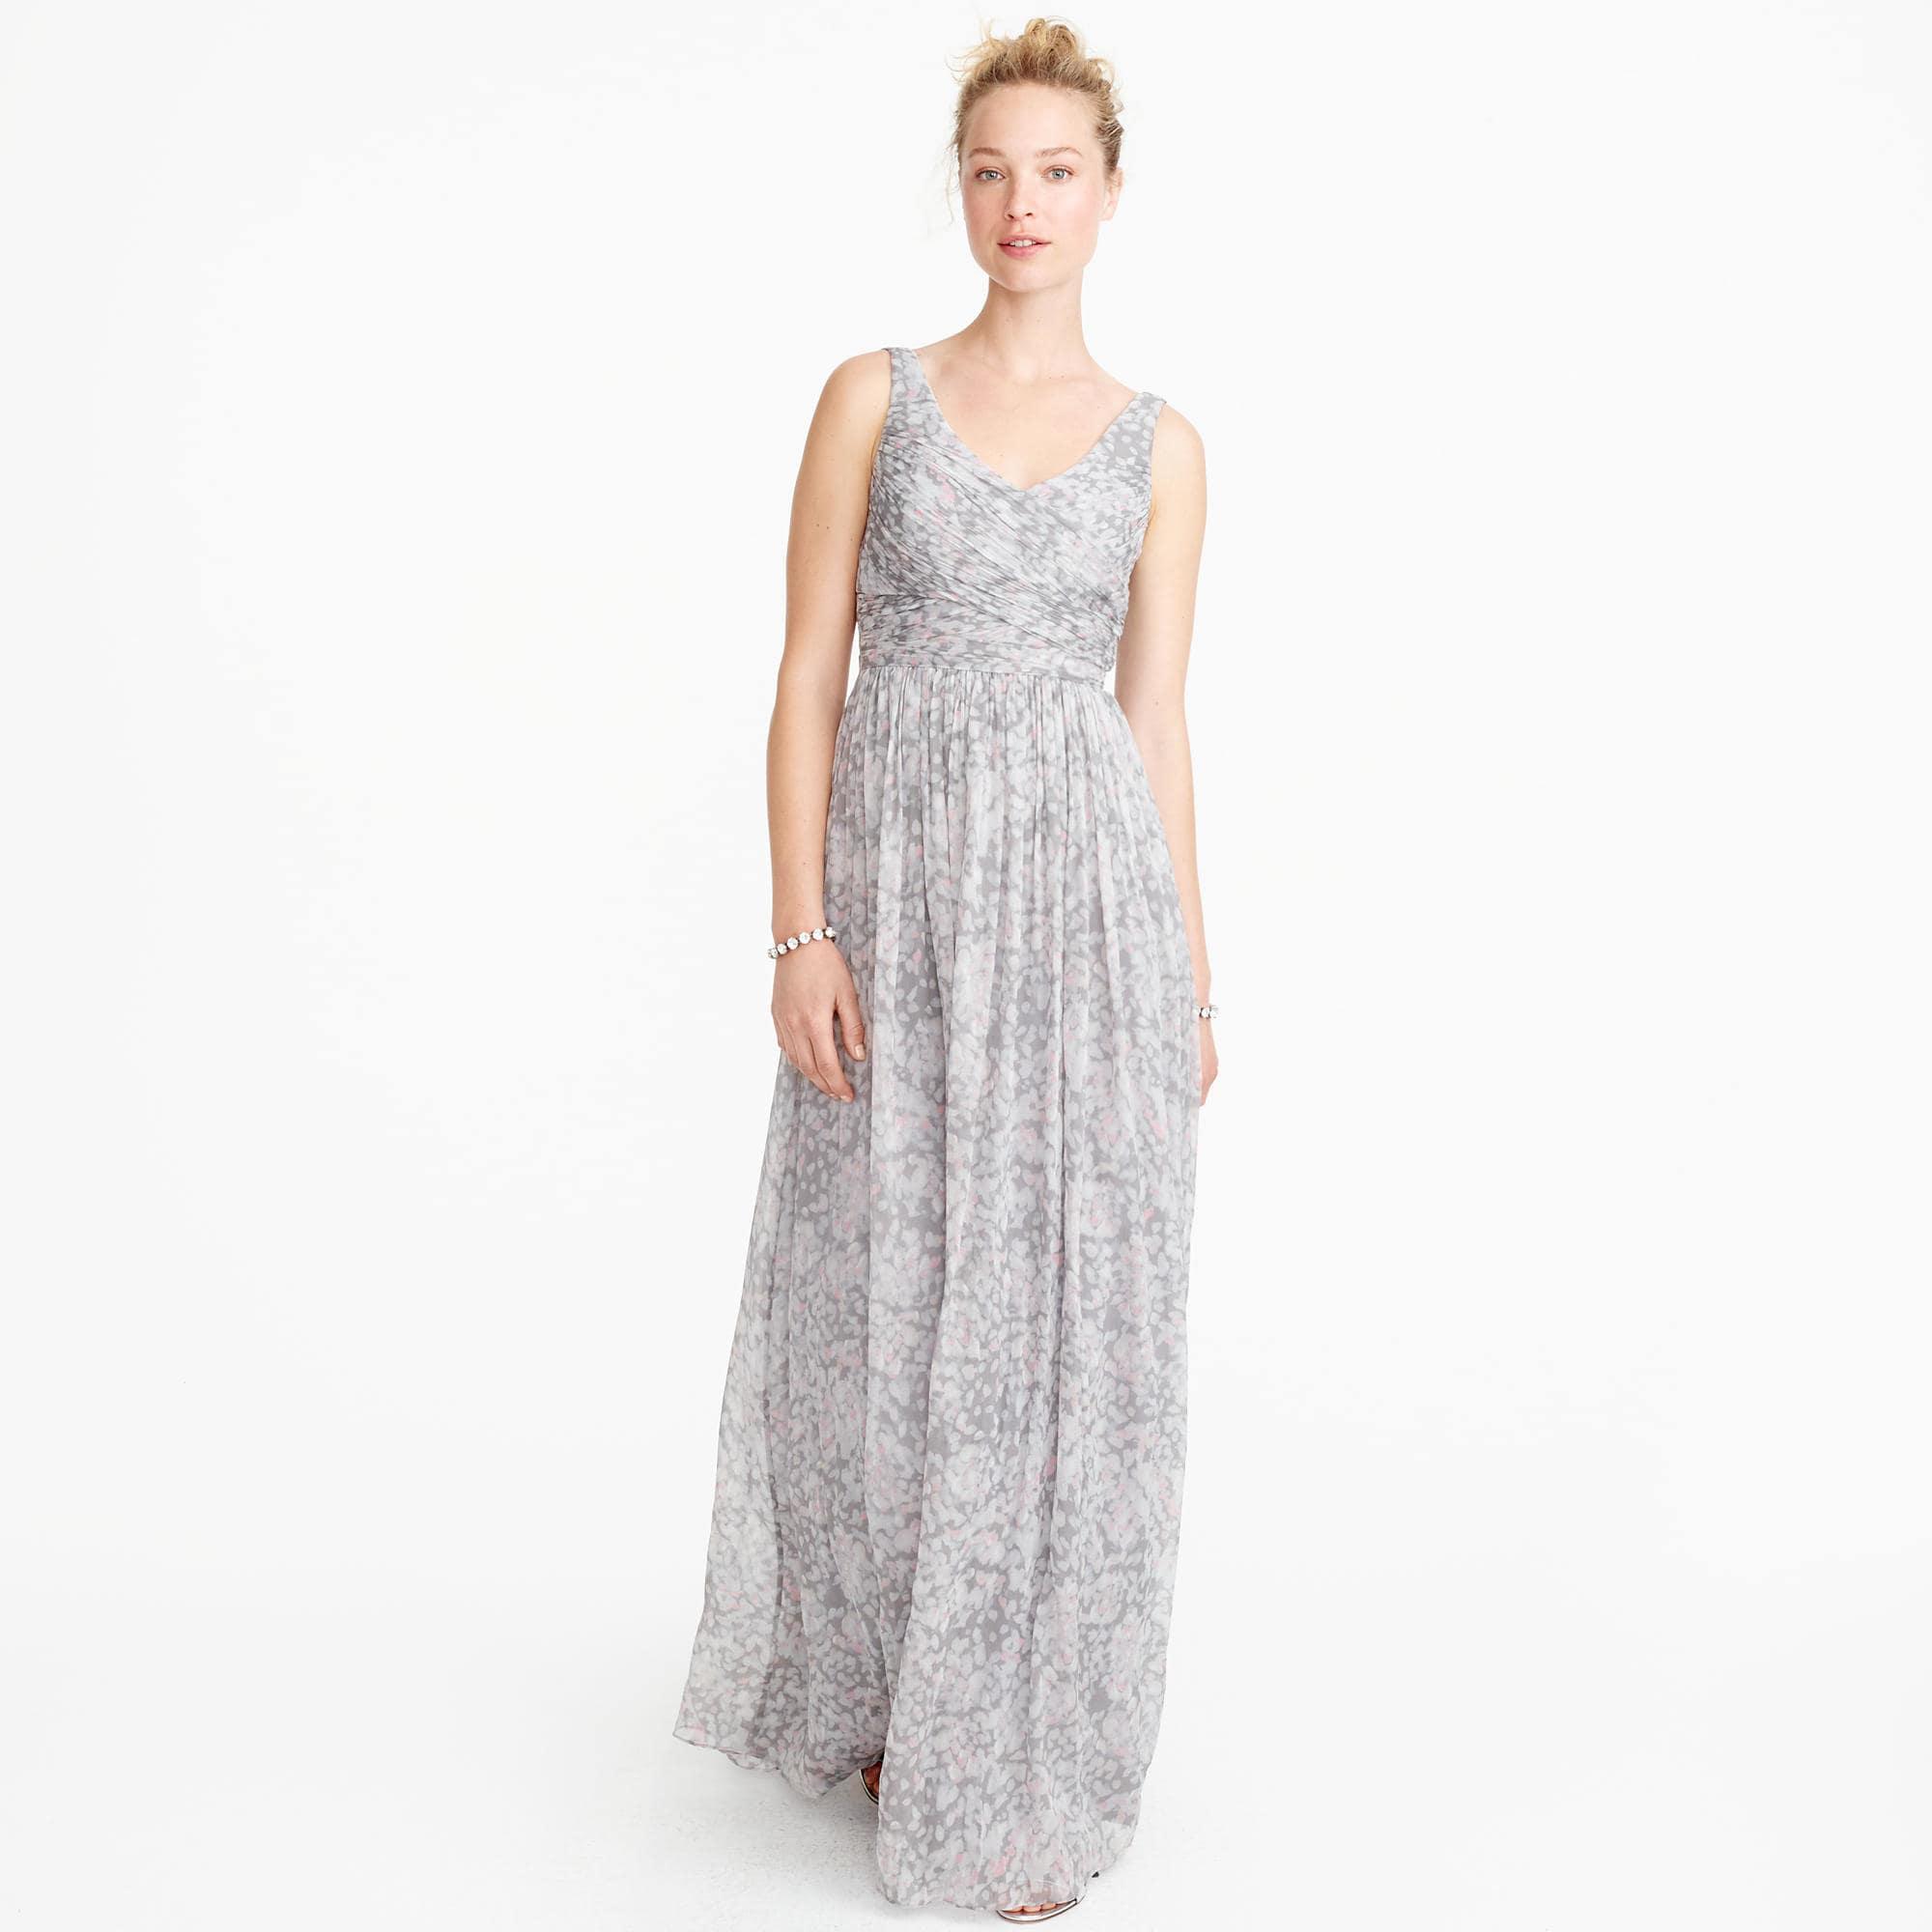 J Crew Gray Heidi Long Dress In Watercolor Silk Chiffon